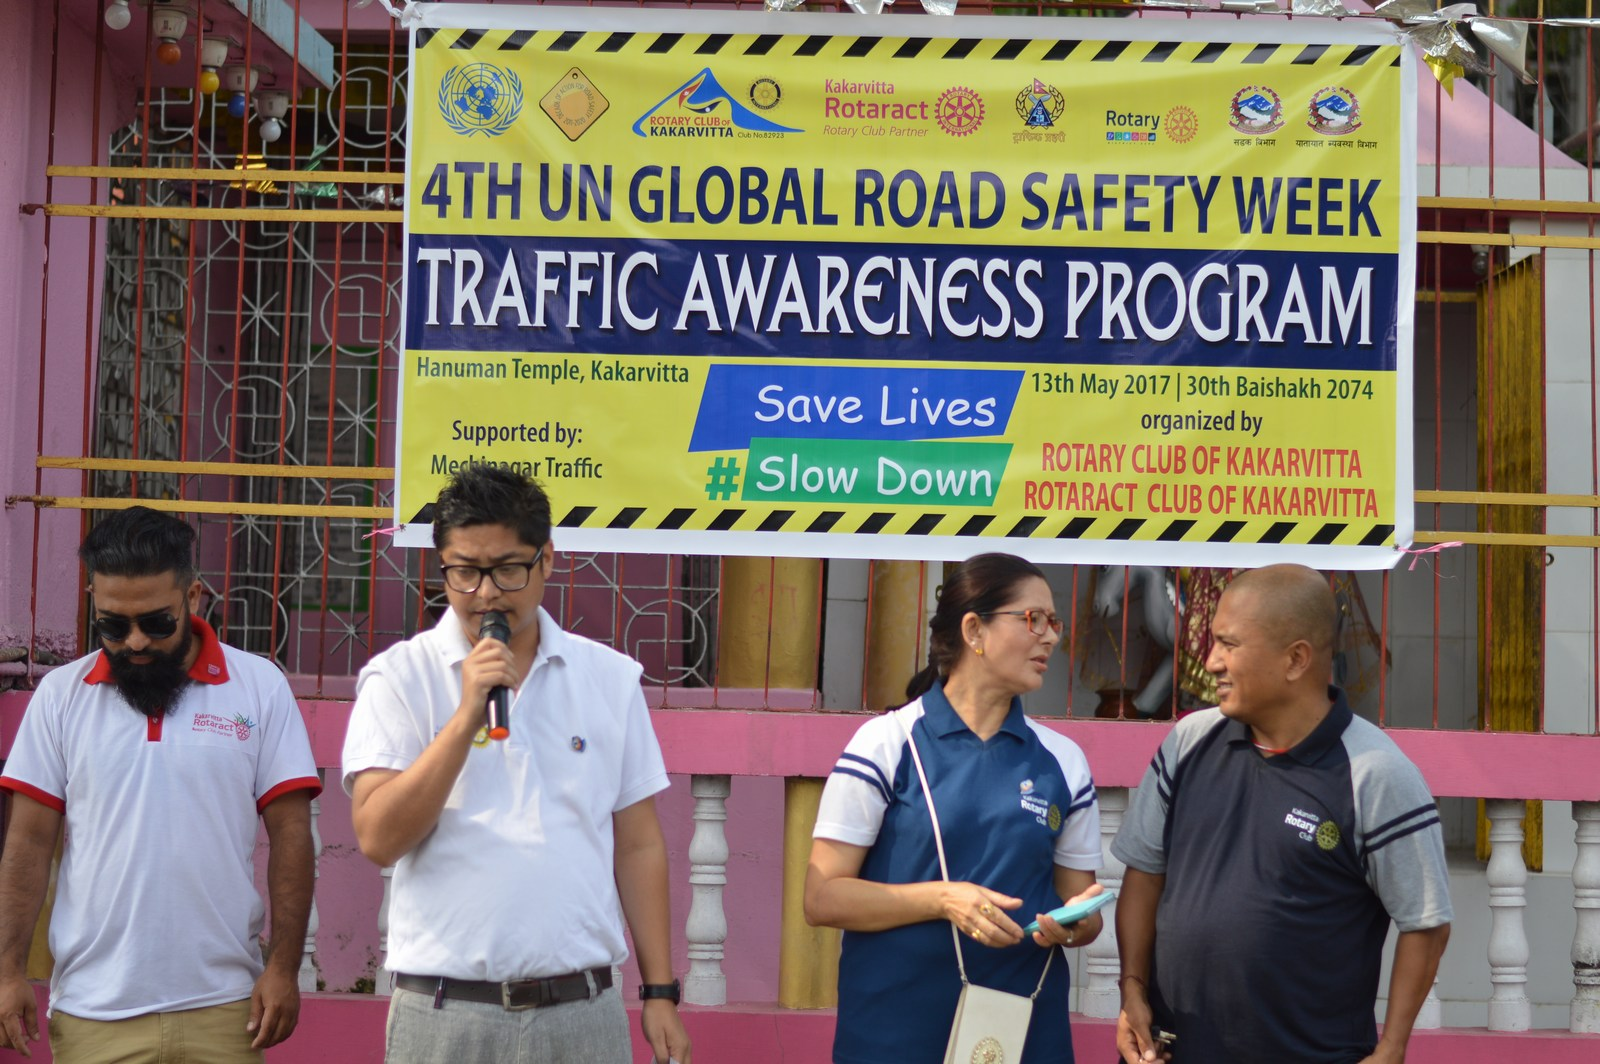 4th-UN-Global-Road-Safety-Week-2017-Traffic-Awareness-Program-Rotary-club-of-Kakarvitta-8